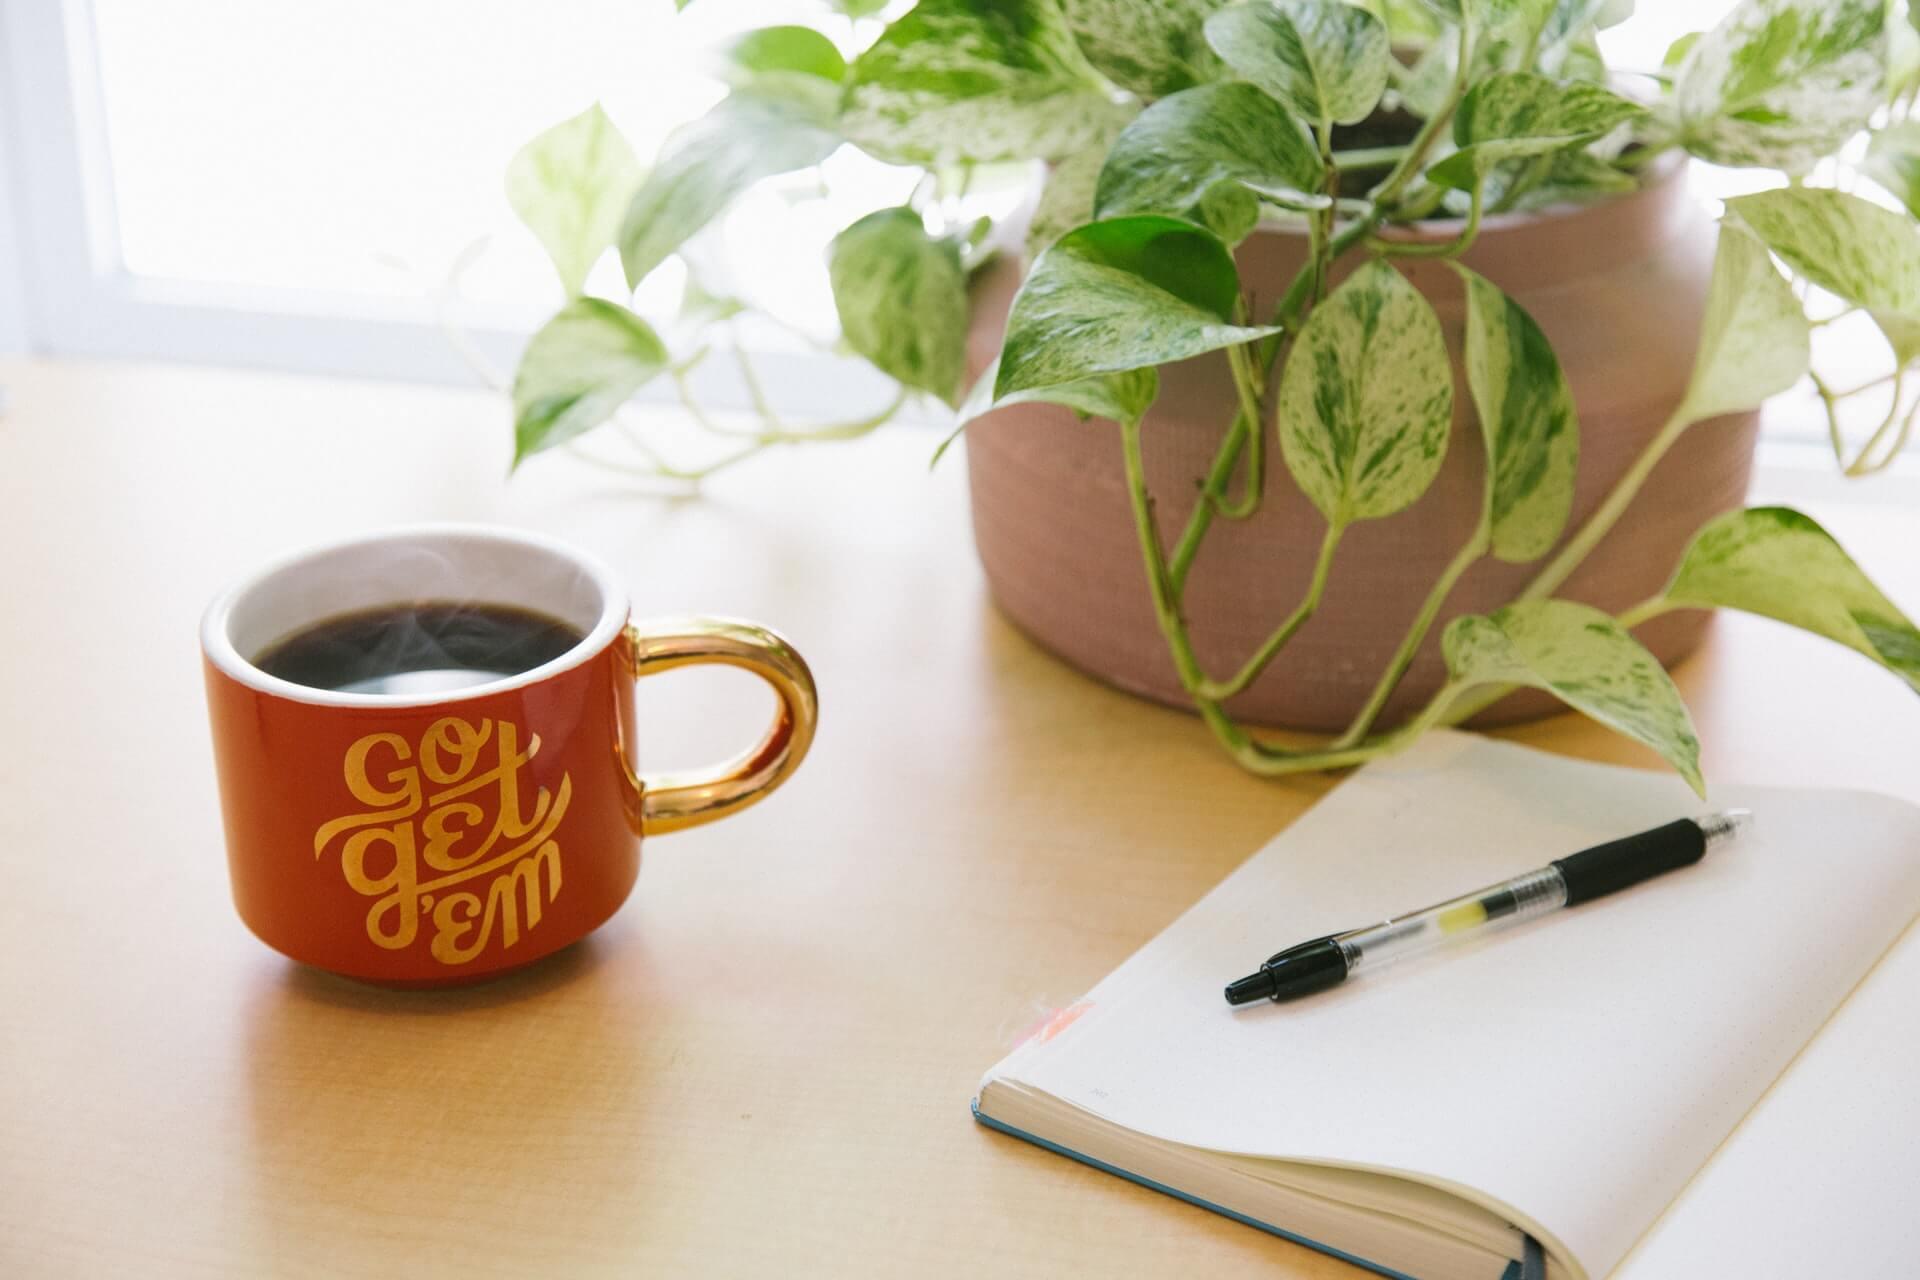 Tasse Go get them, carnet et plante - kyle-glenn-_AR74EoWdy0-unsplash